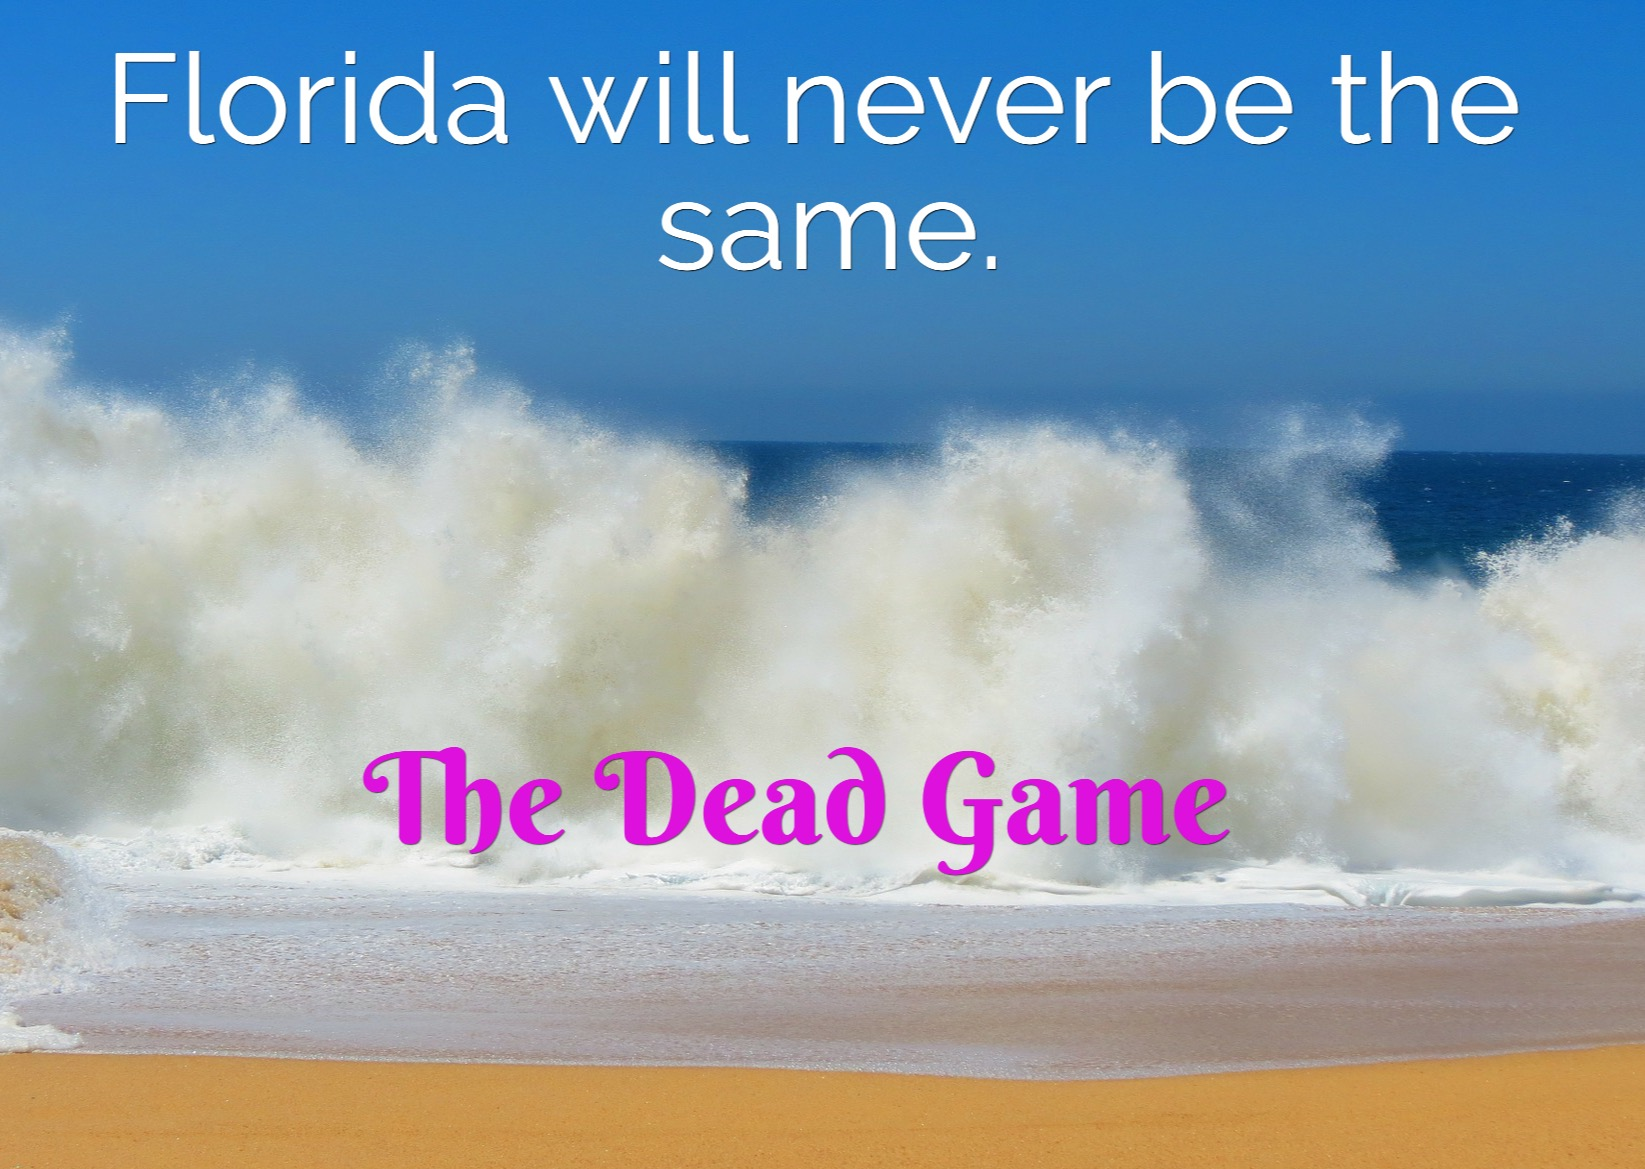 Florida never be same